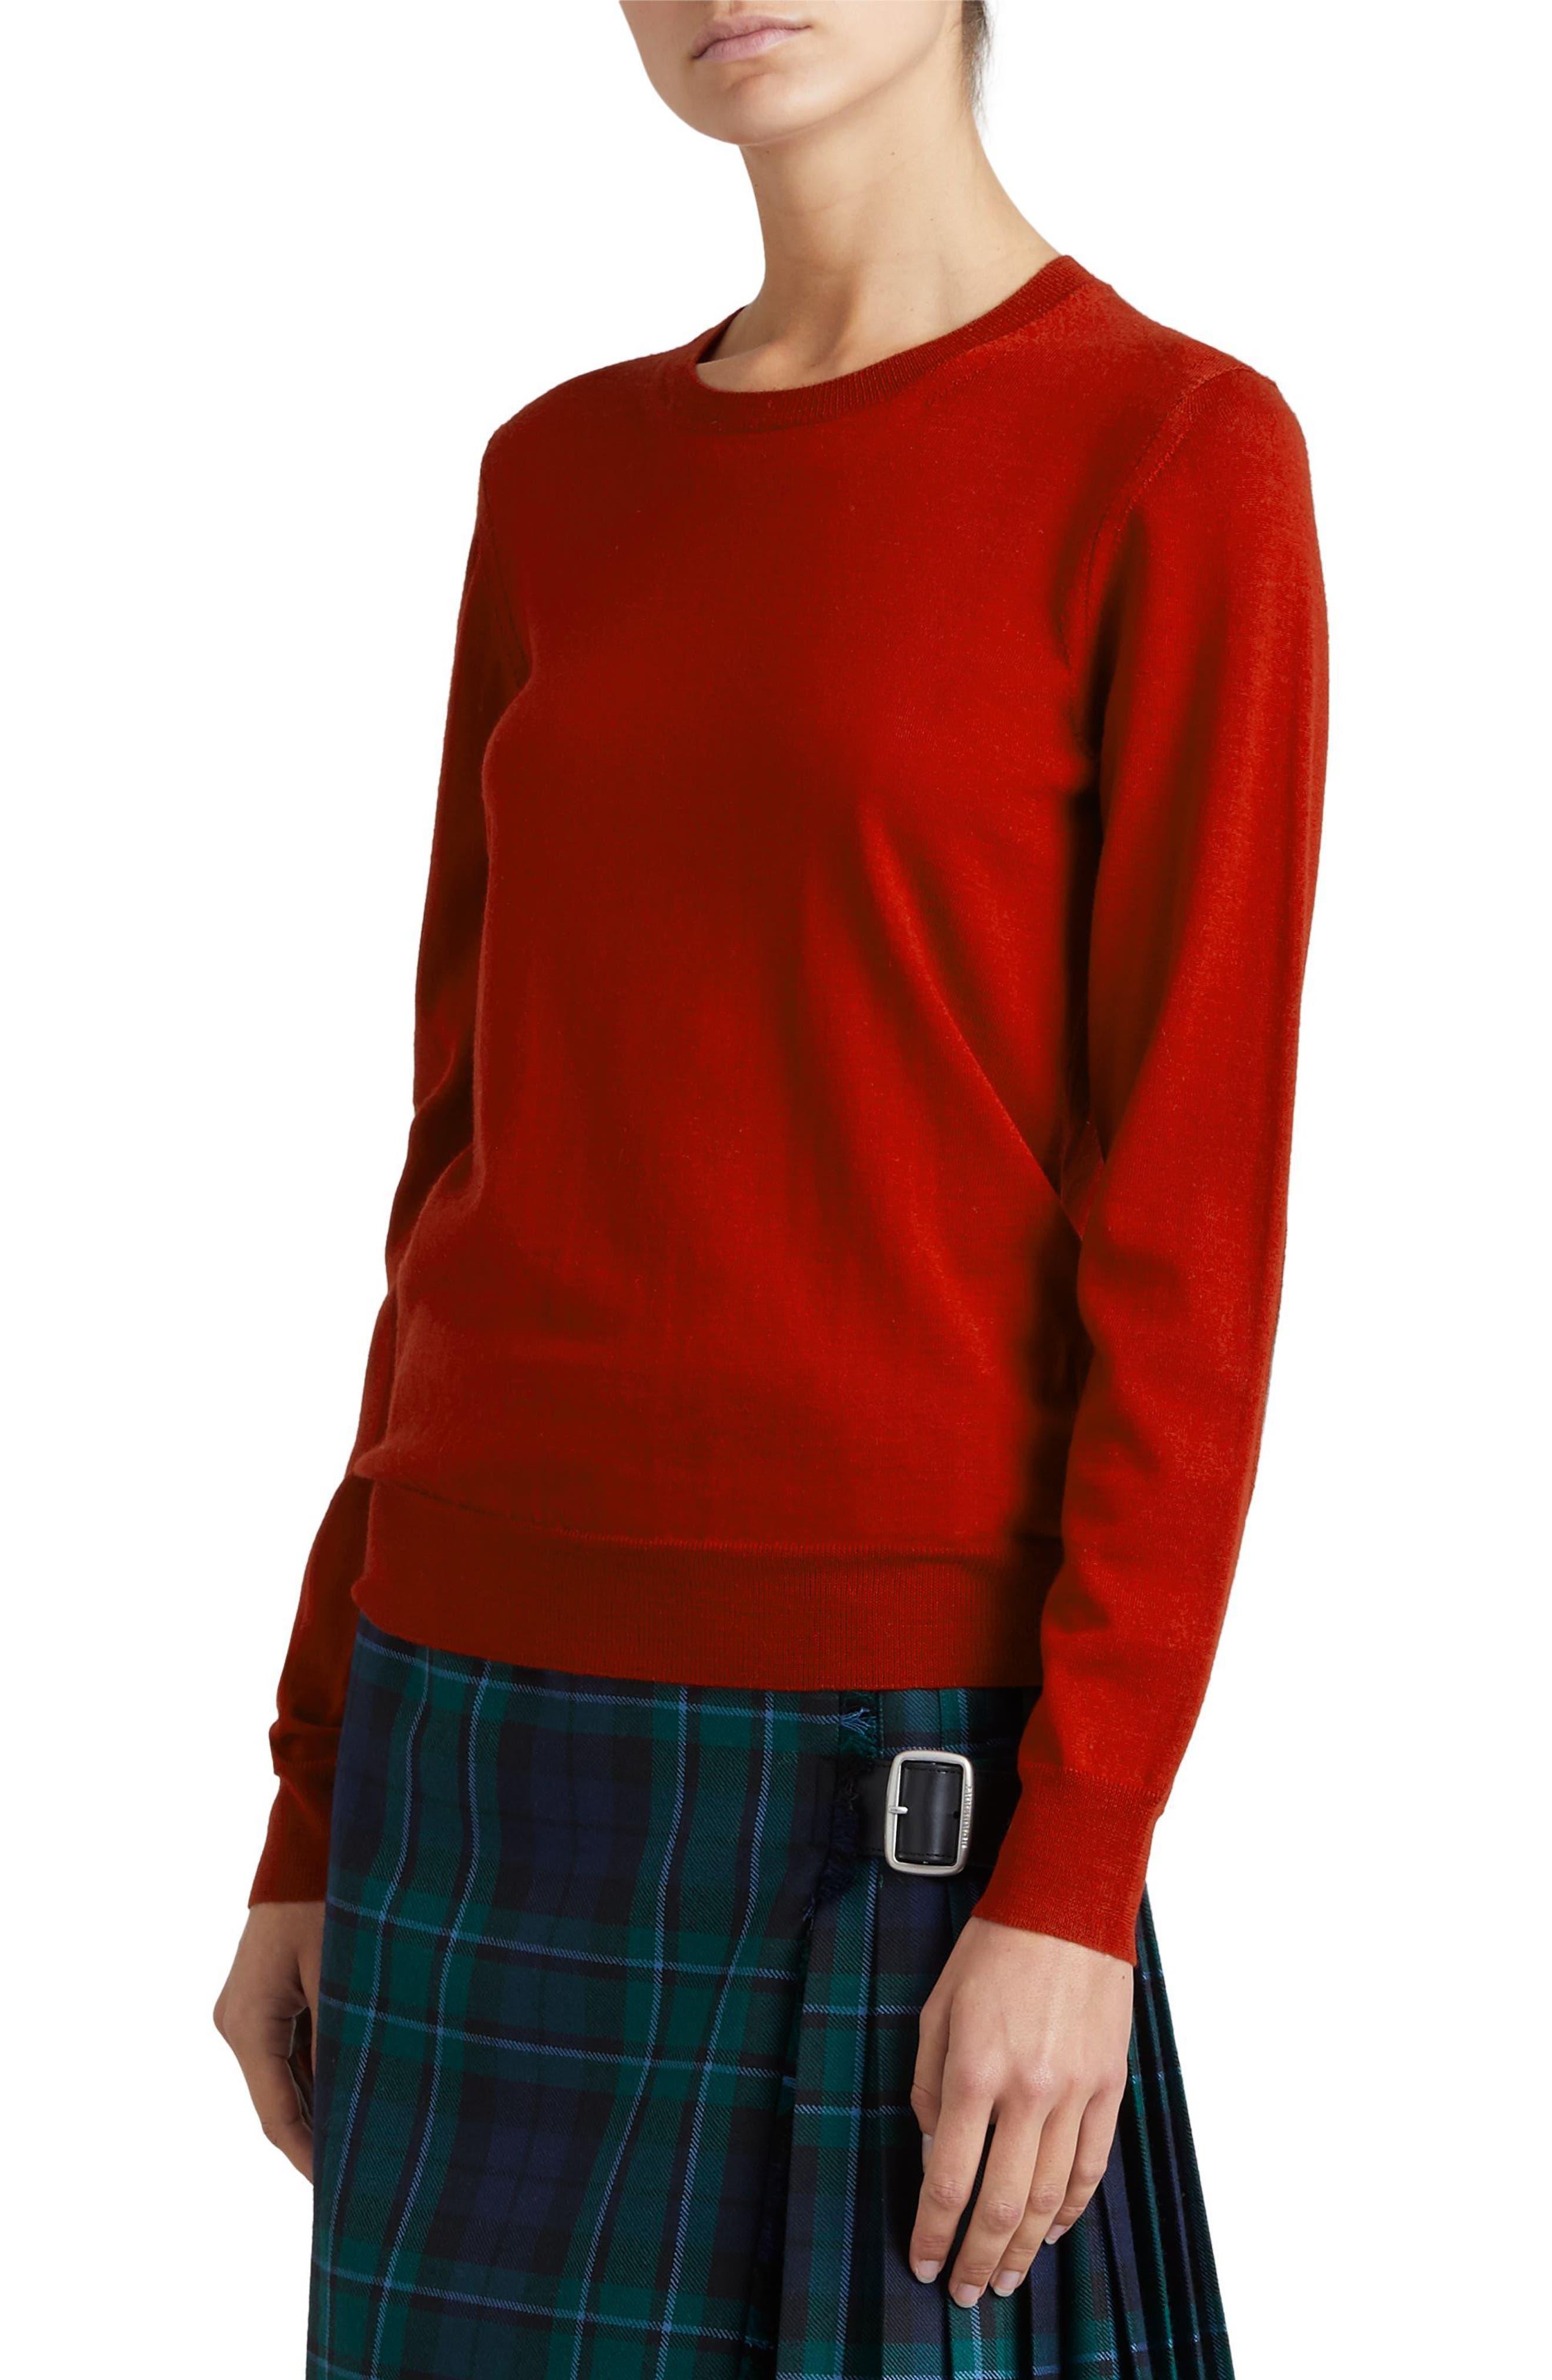 Alternate Image 1 Selected - Burberry Viar Merino Wool Sweater